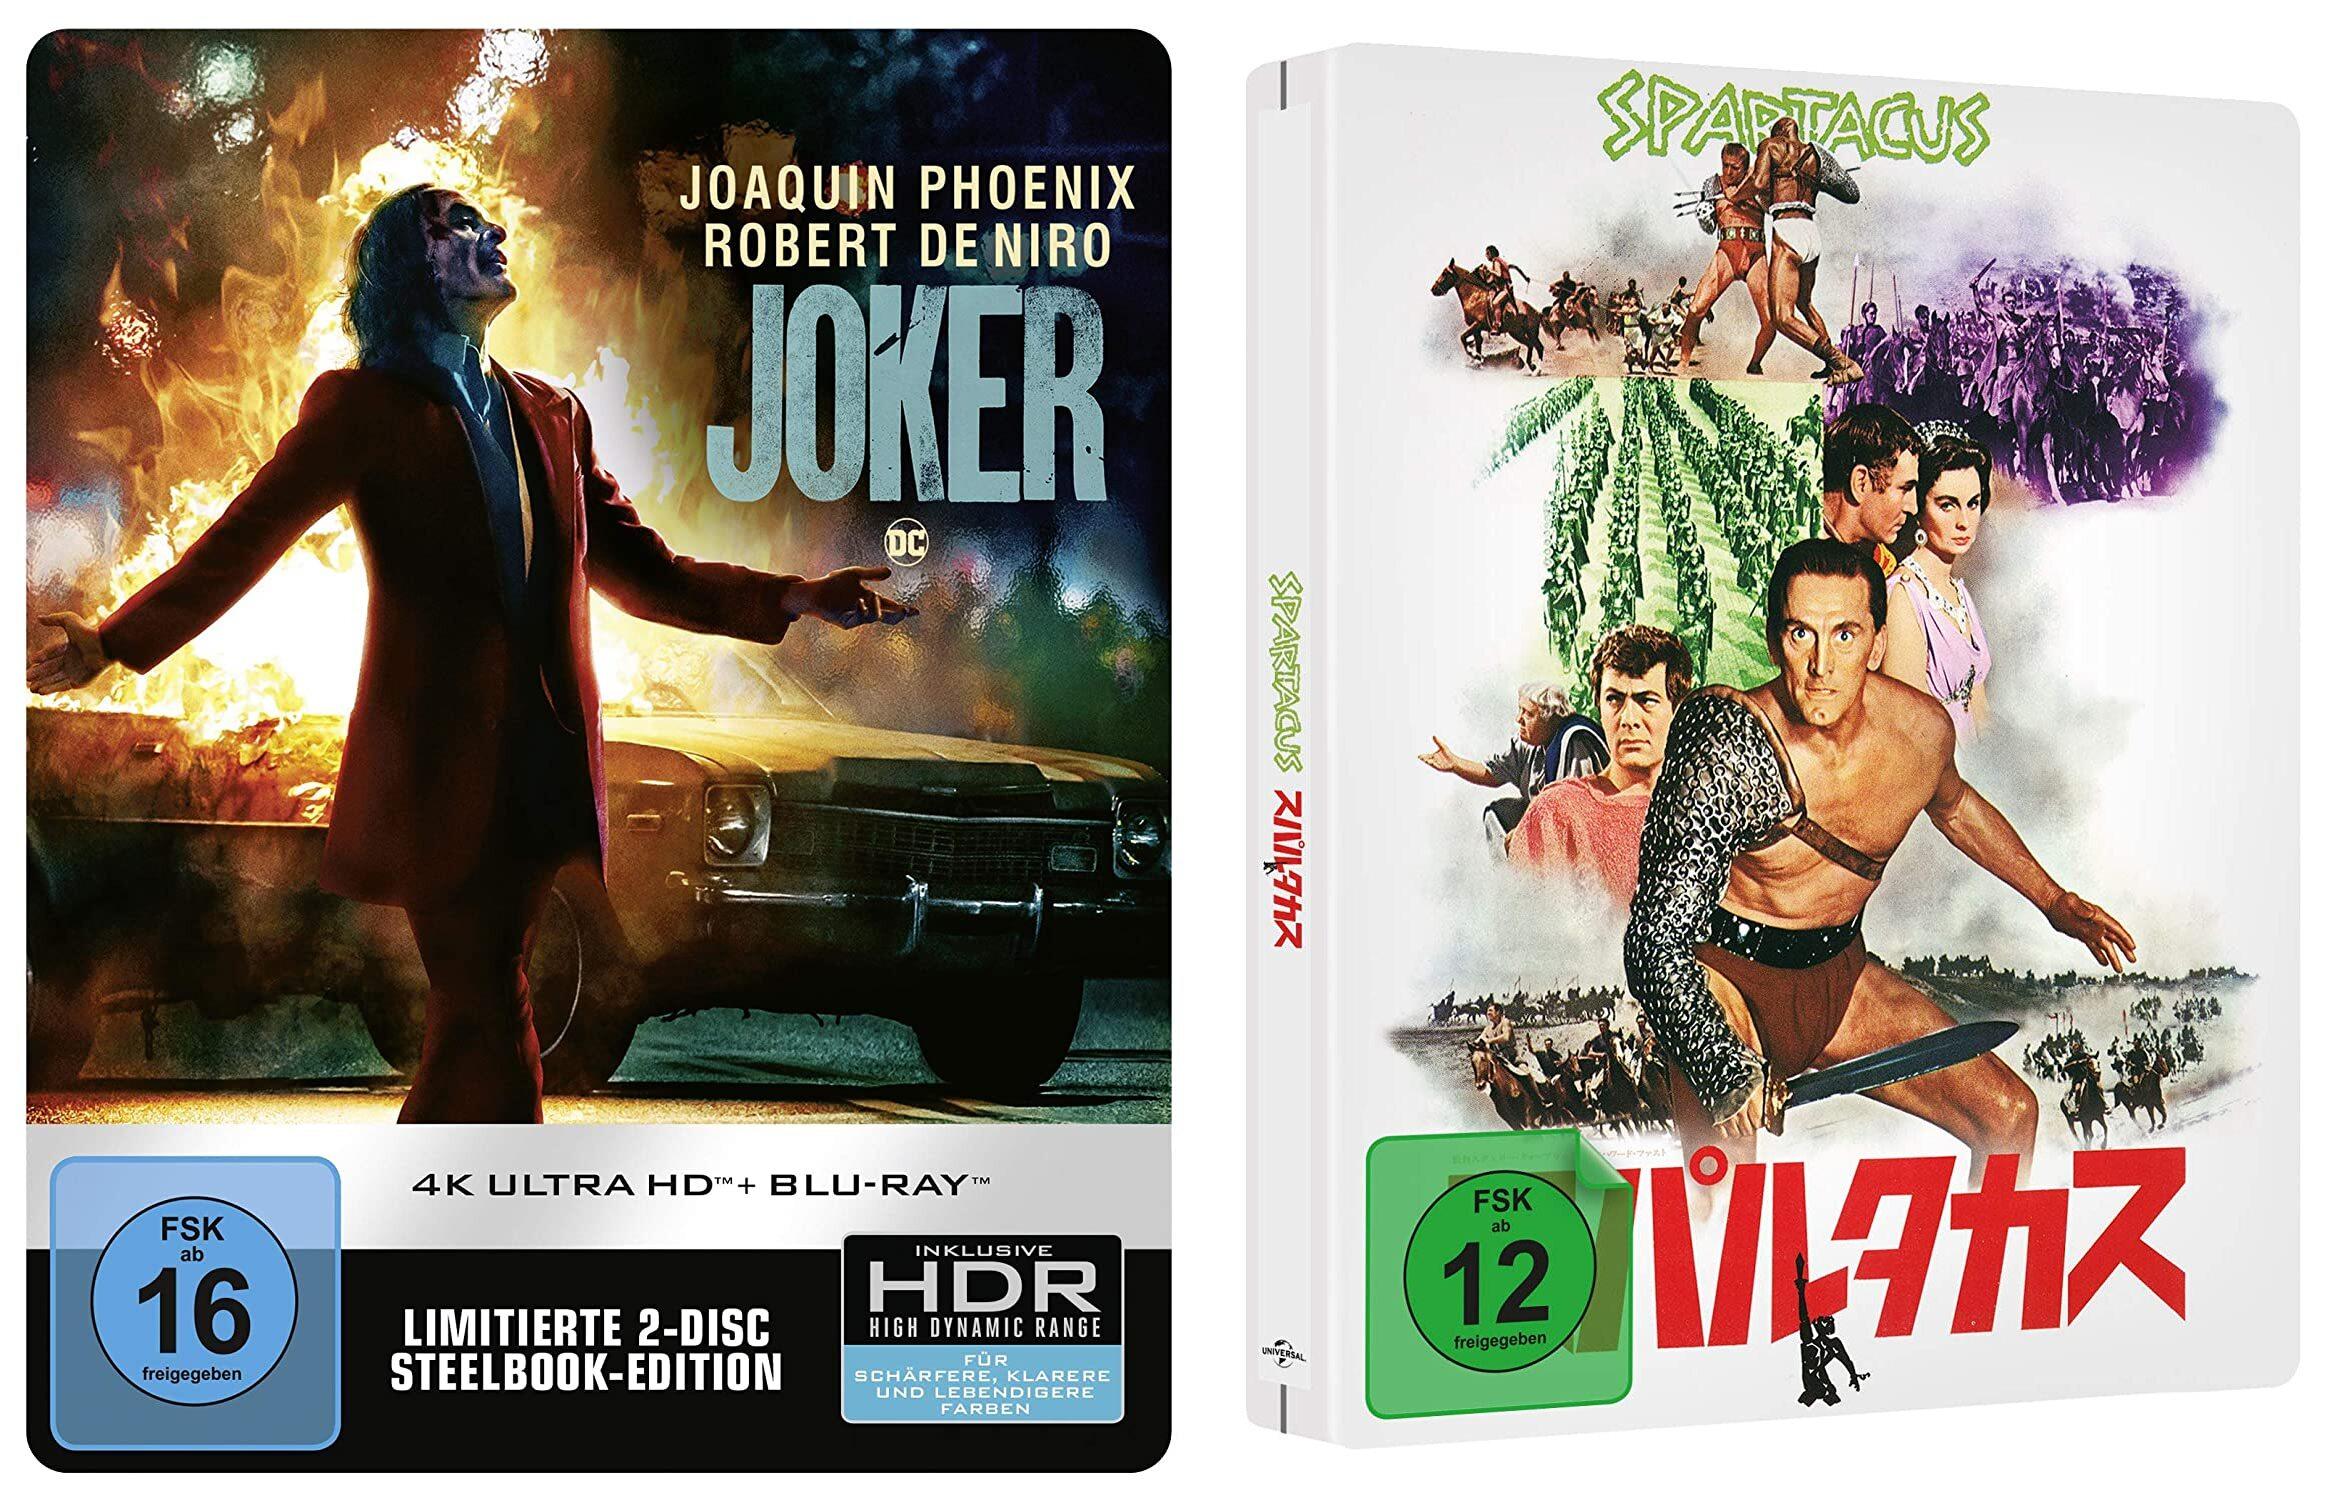 2 4K Ultra HD Blu-ray für 35€ z.B. Joker 4K UHD + 2D Steelbook und Spartacus - LIMITED JAPANESE STEELBOOK (4k UHD) [Blu-ray]